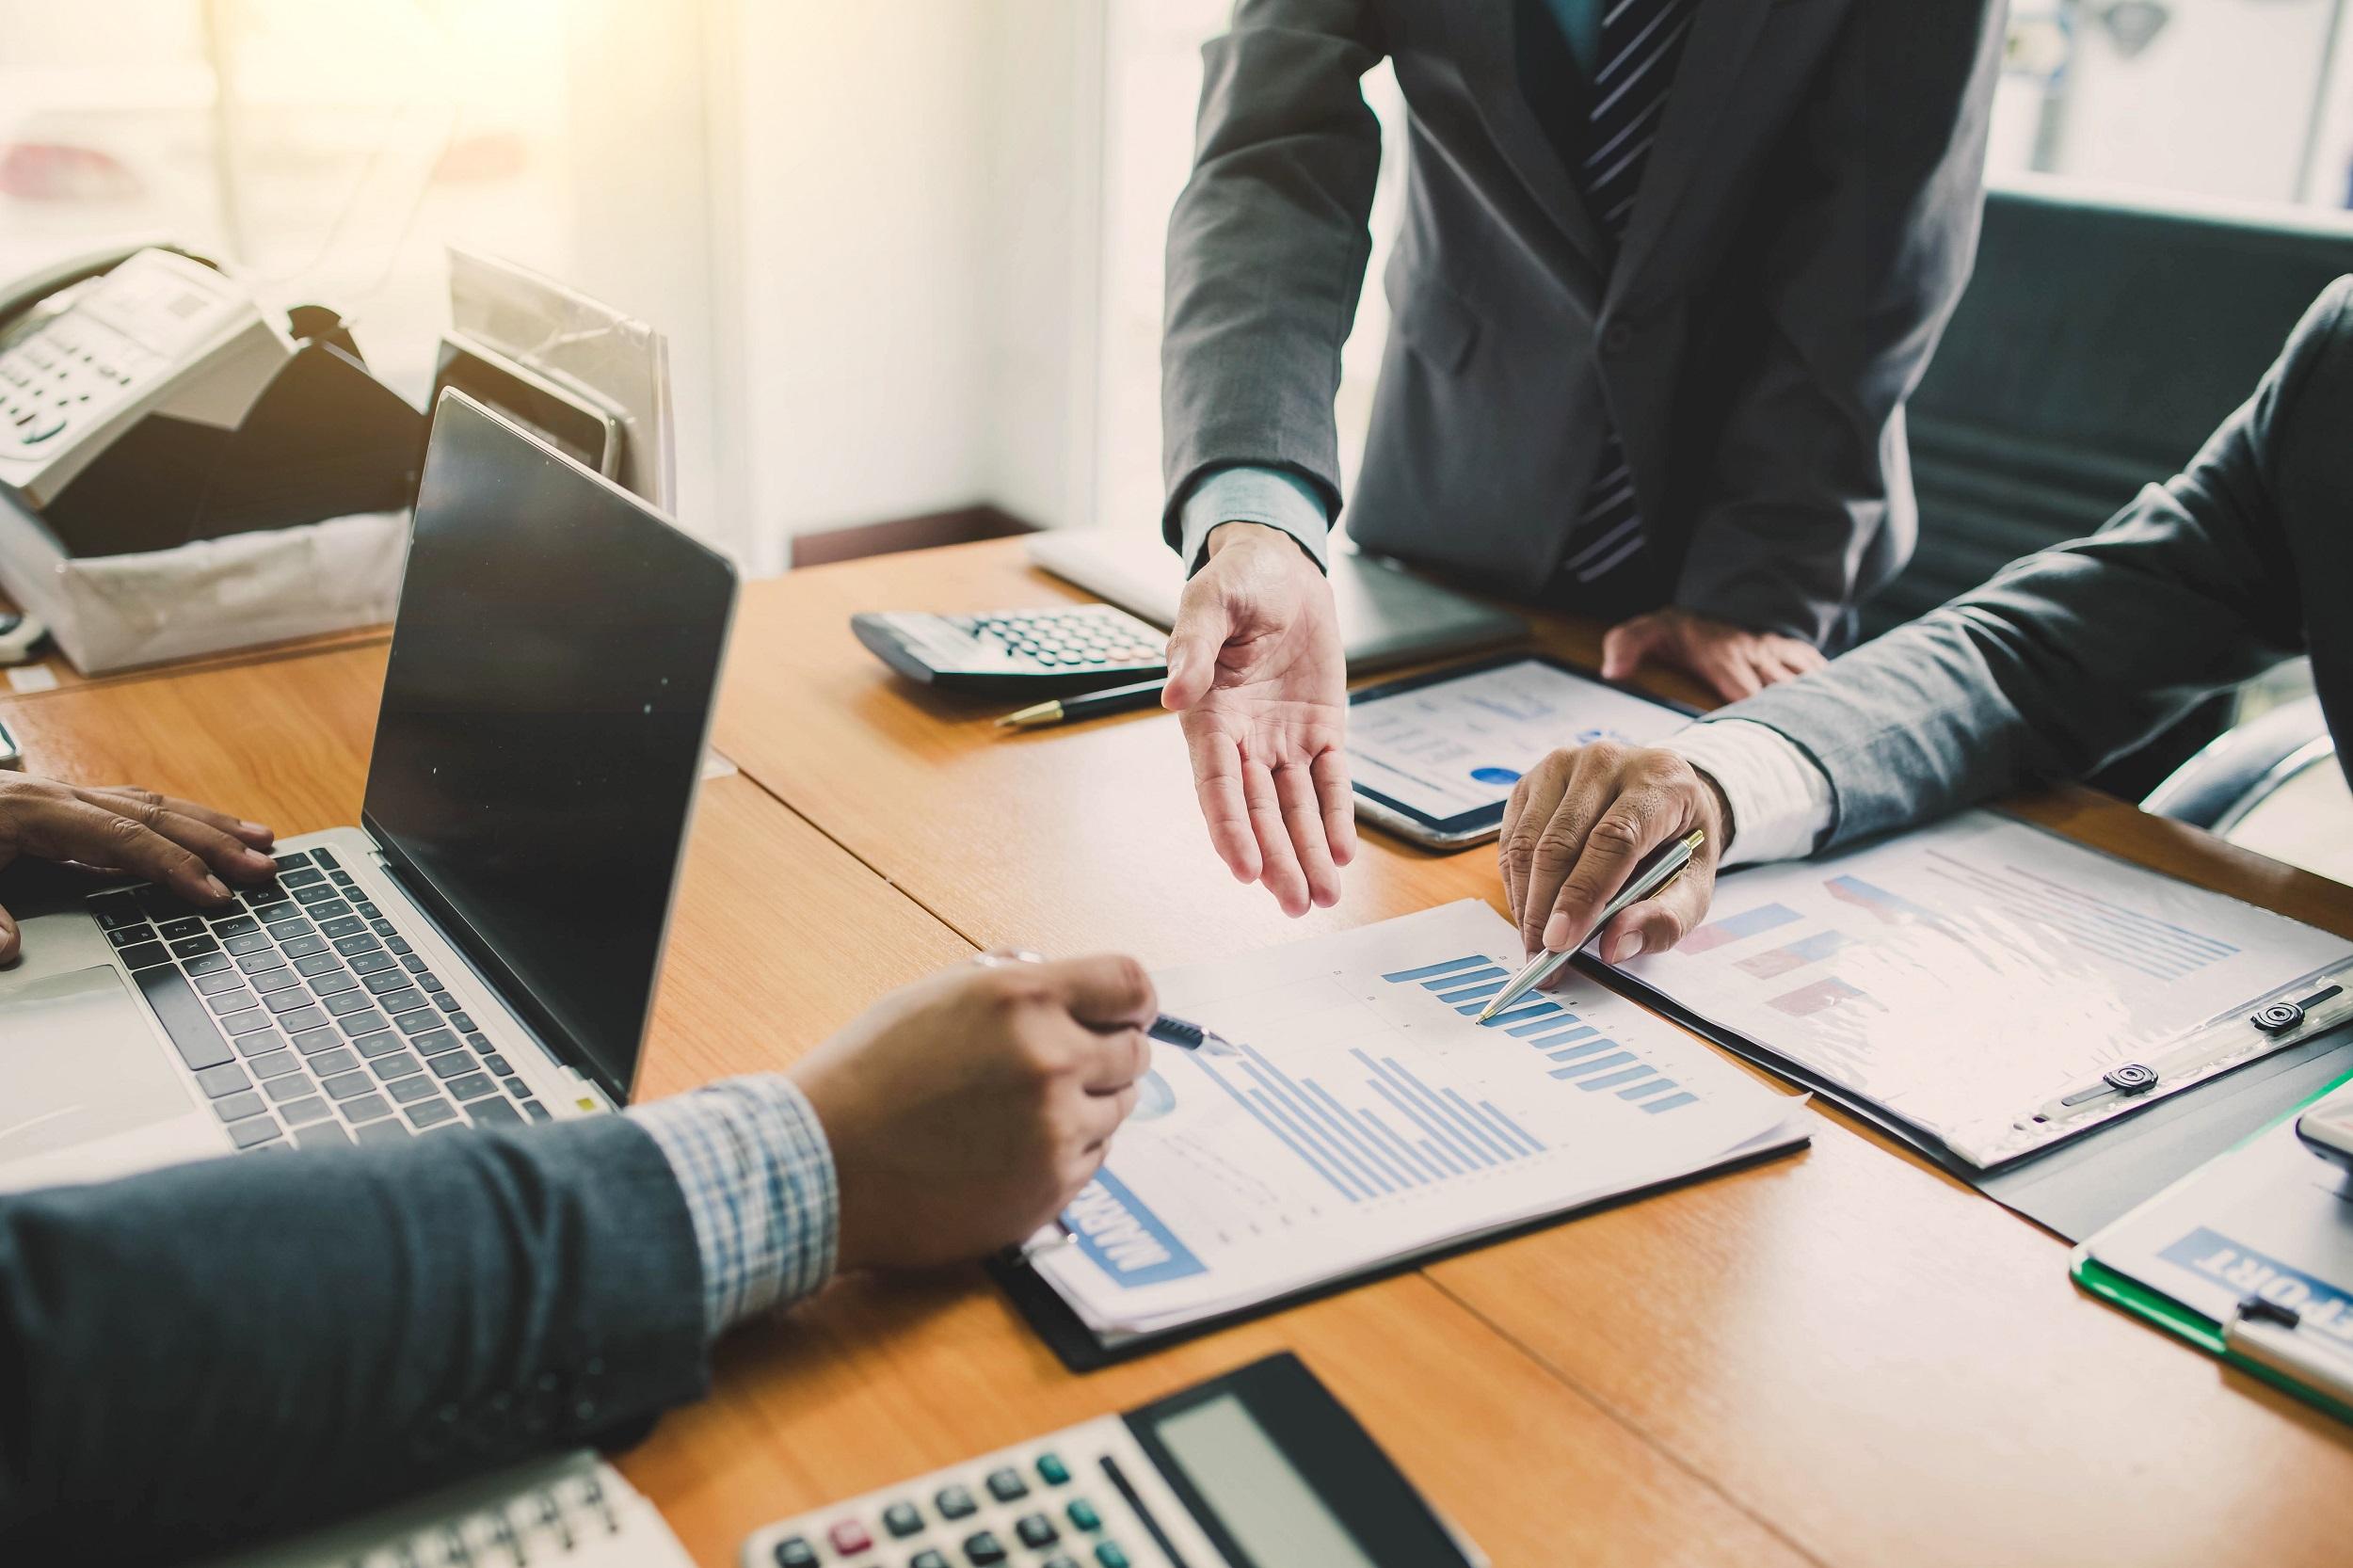 Three men analyze a revenue chart on paper